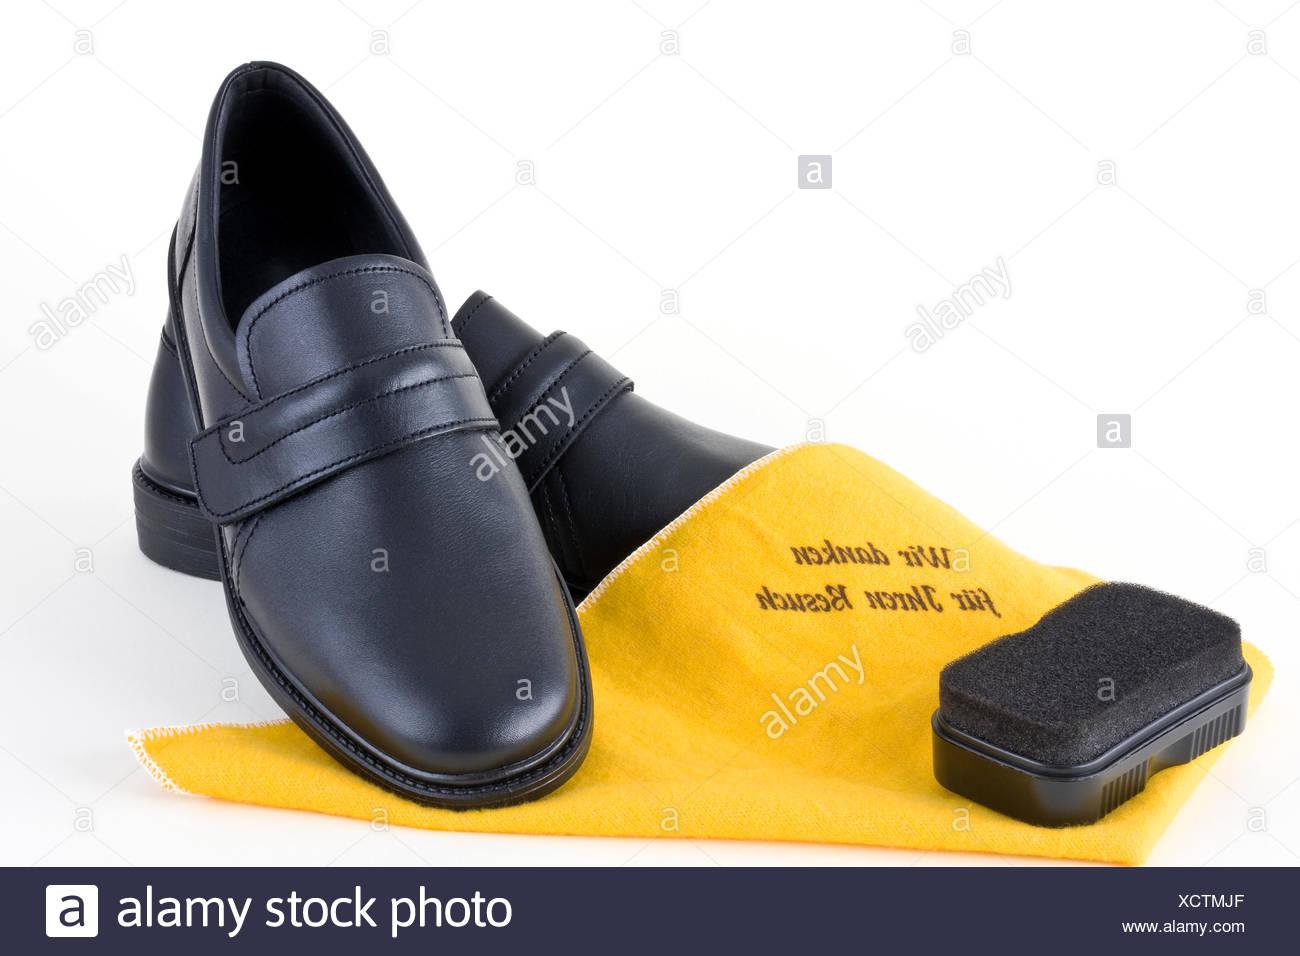 clothes adornment - Stock Image